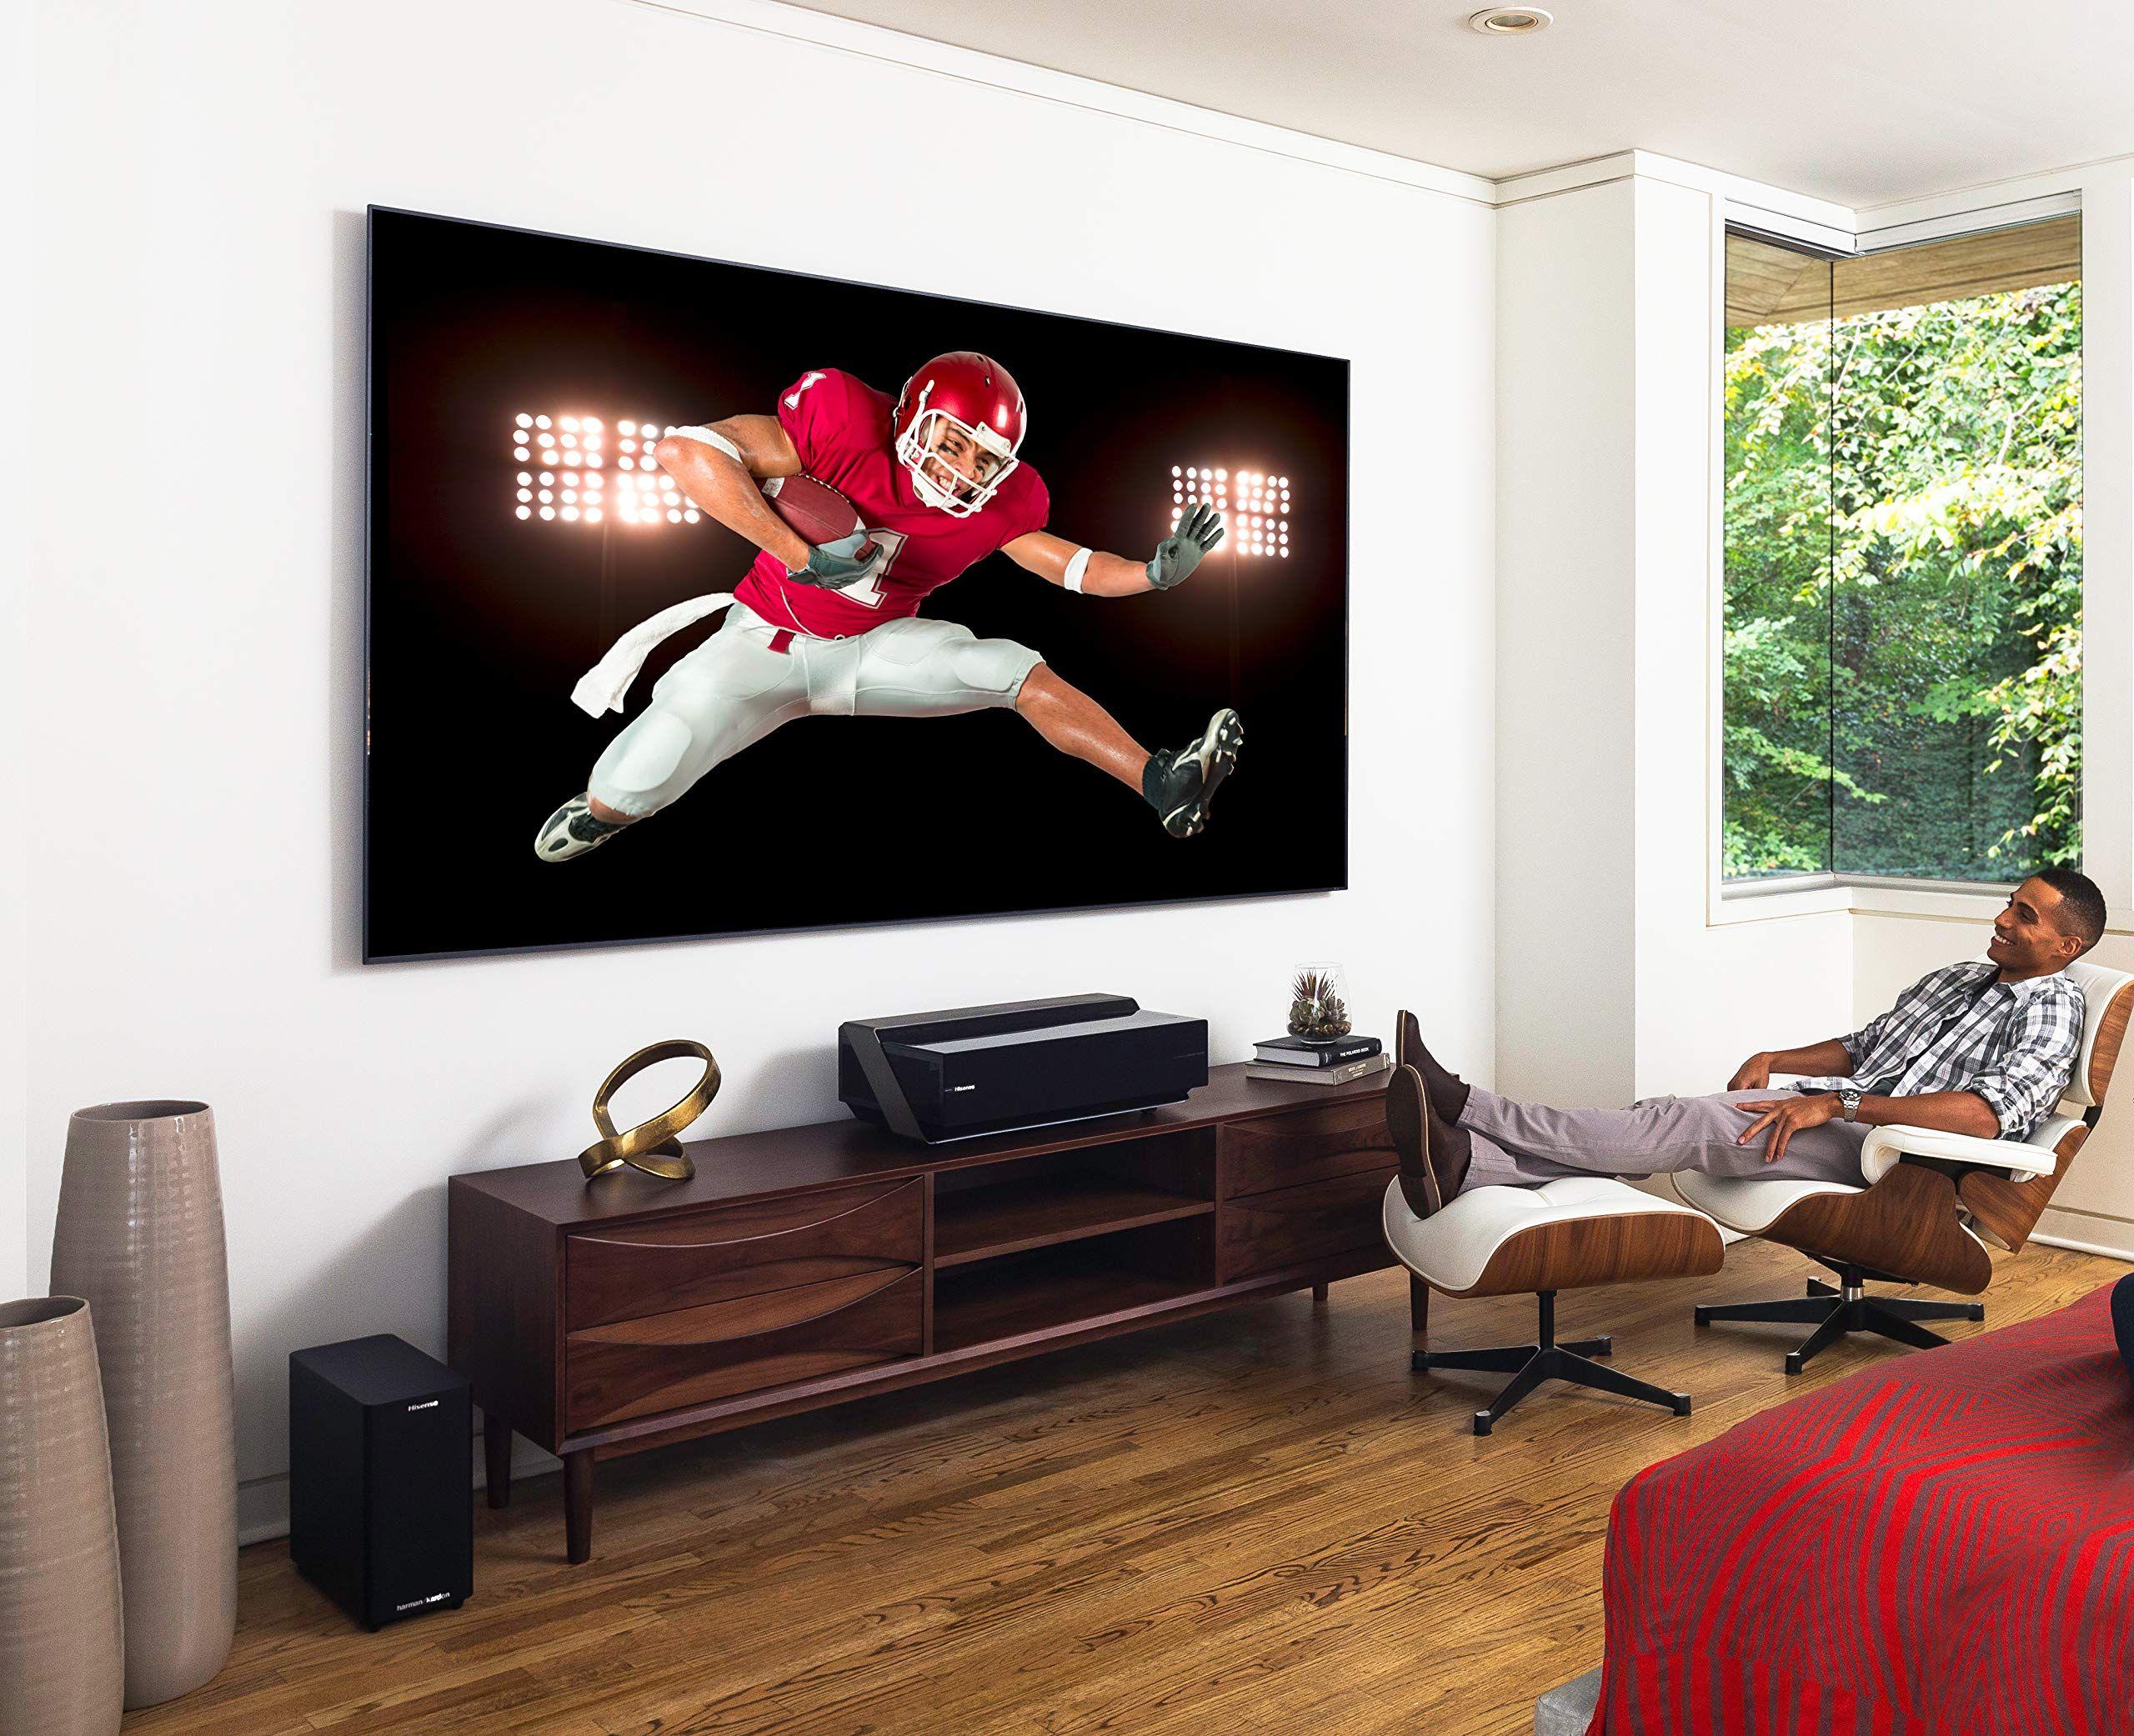 5 best projector 2019 best 4k projectors 2019 on amazon